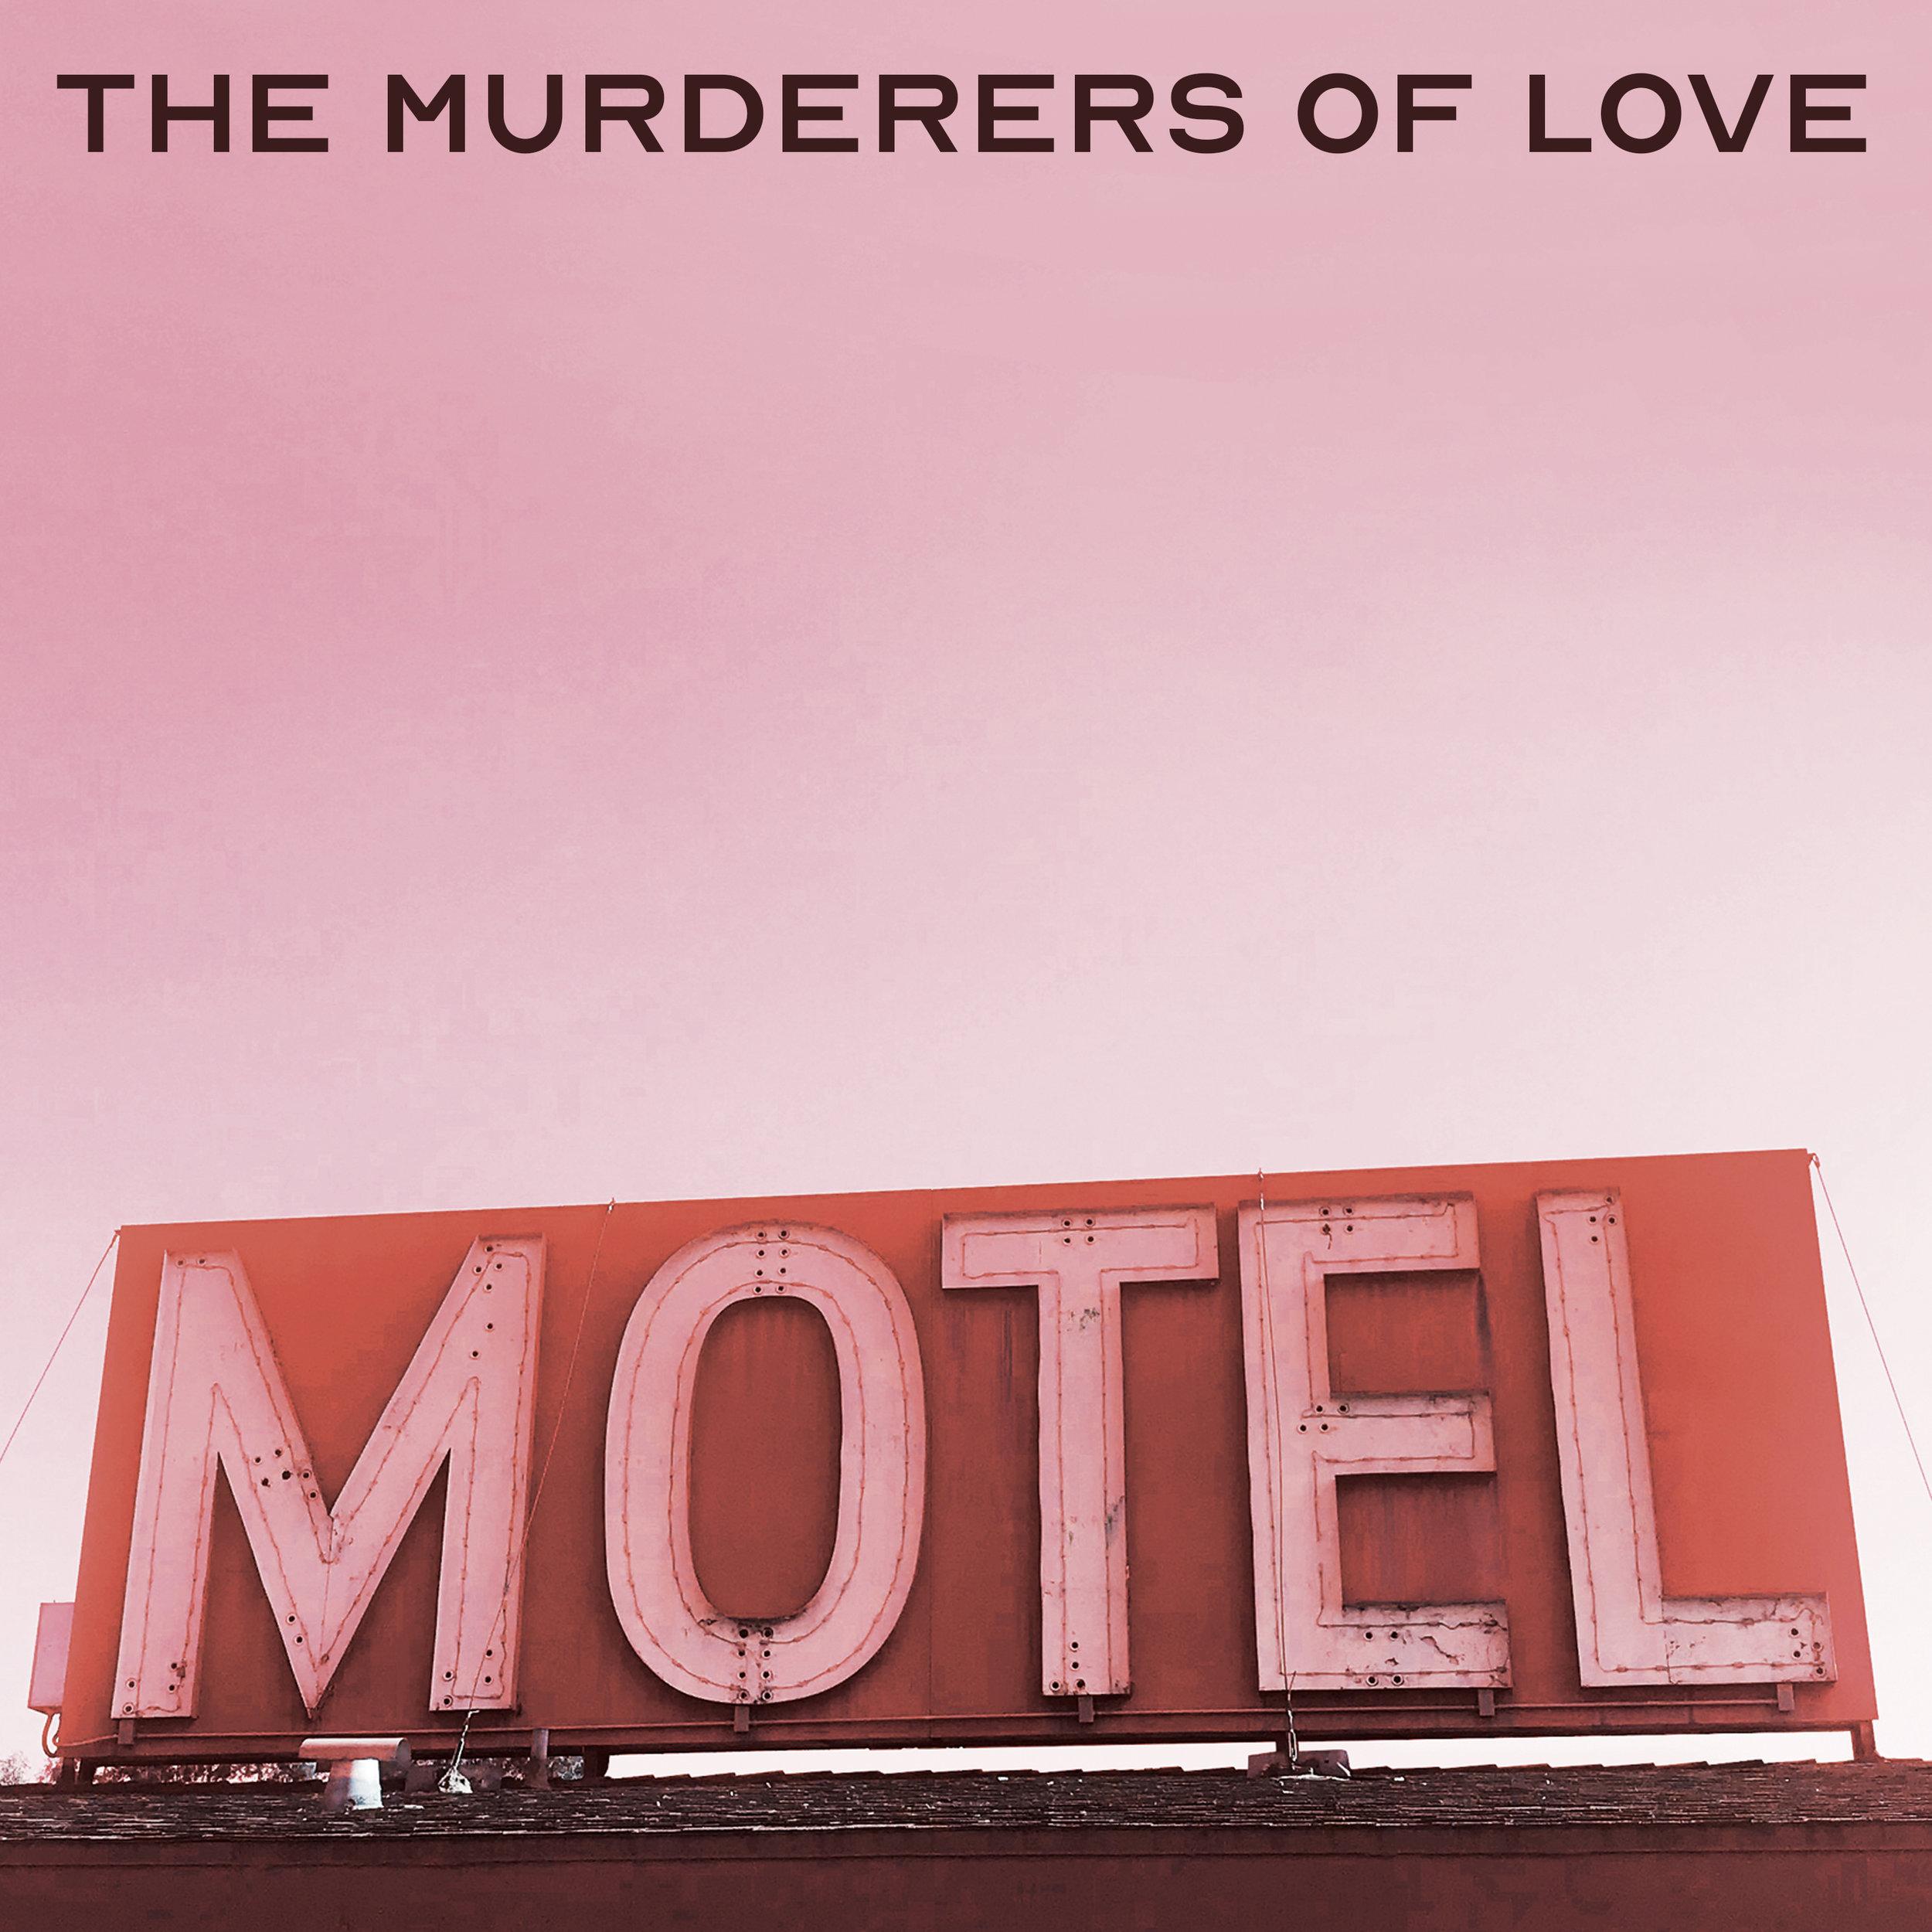 The Murderers of Love • Motel • Album Cover